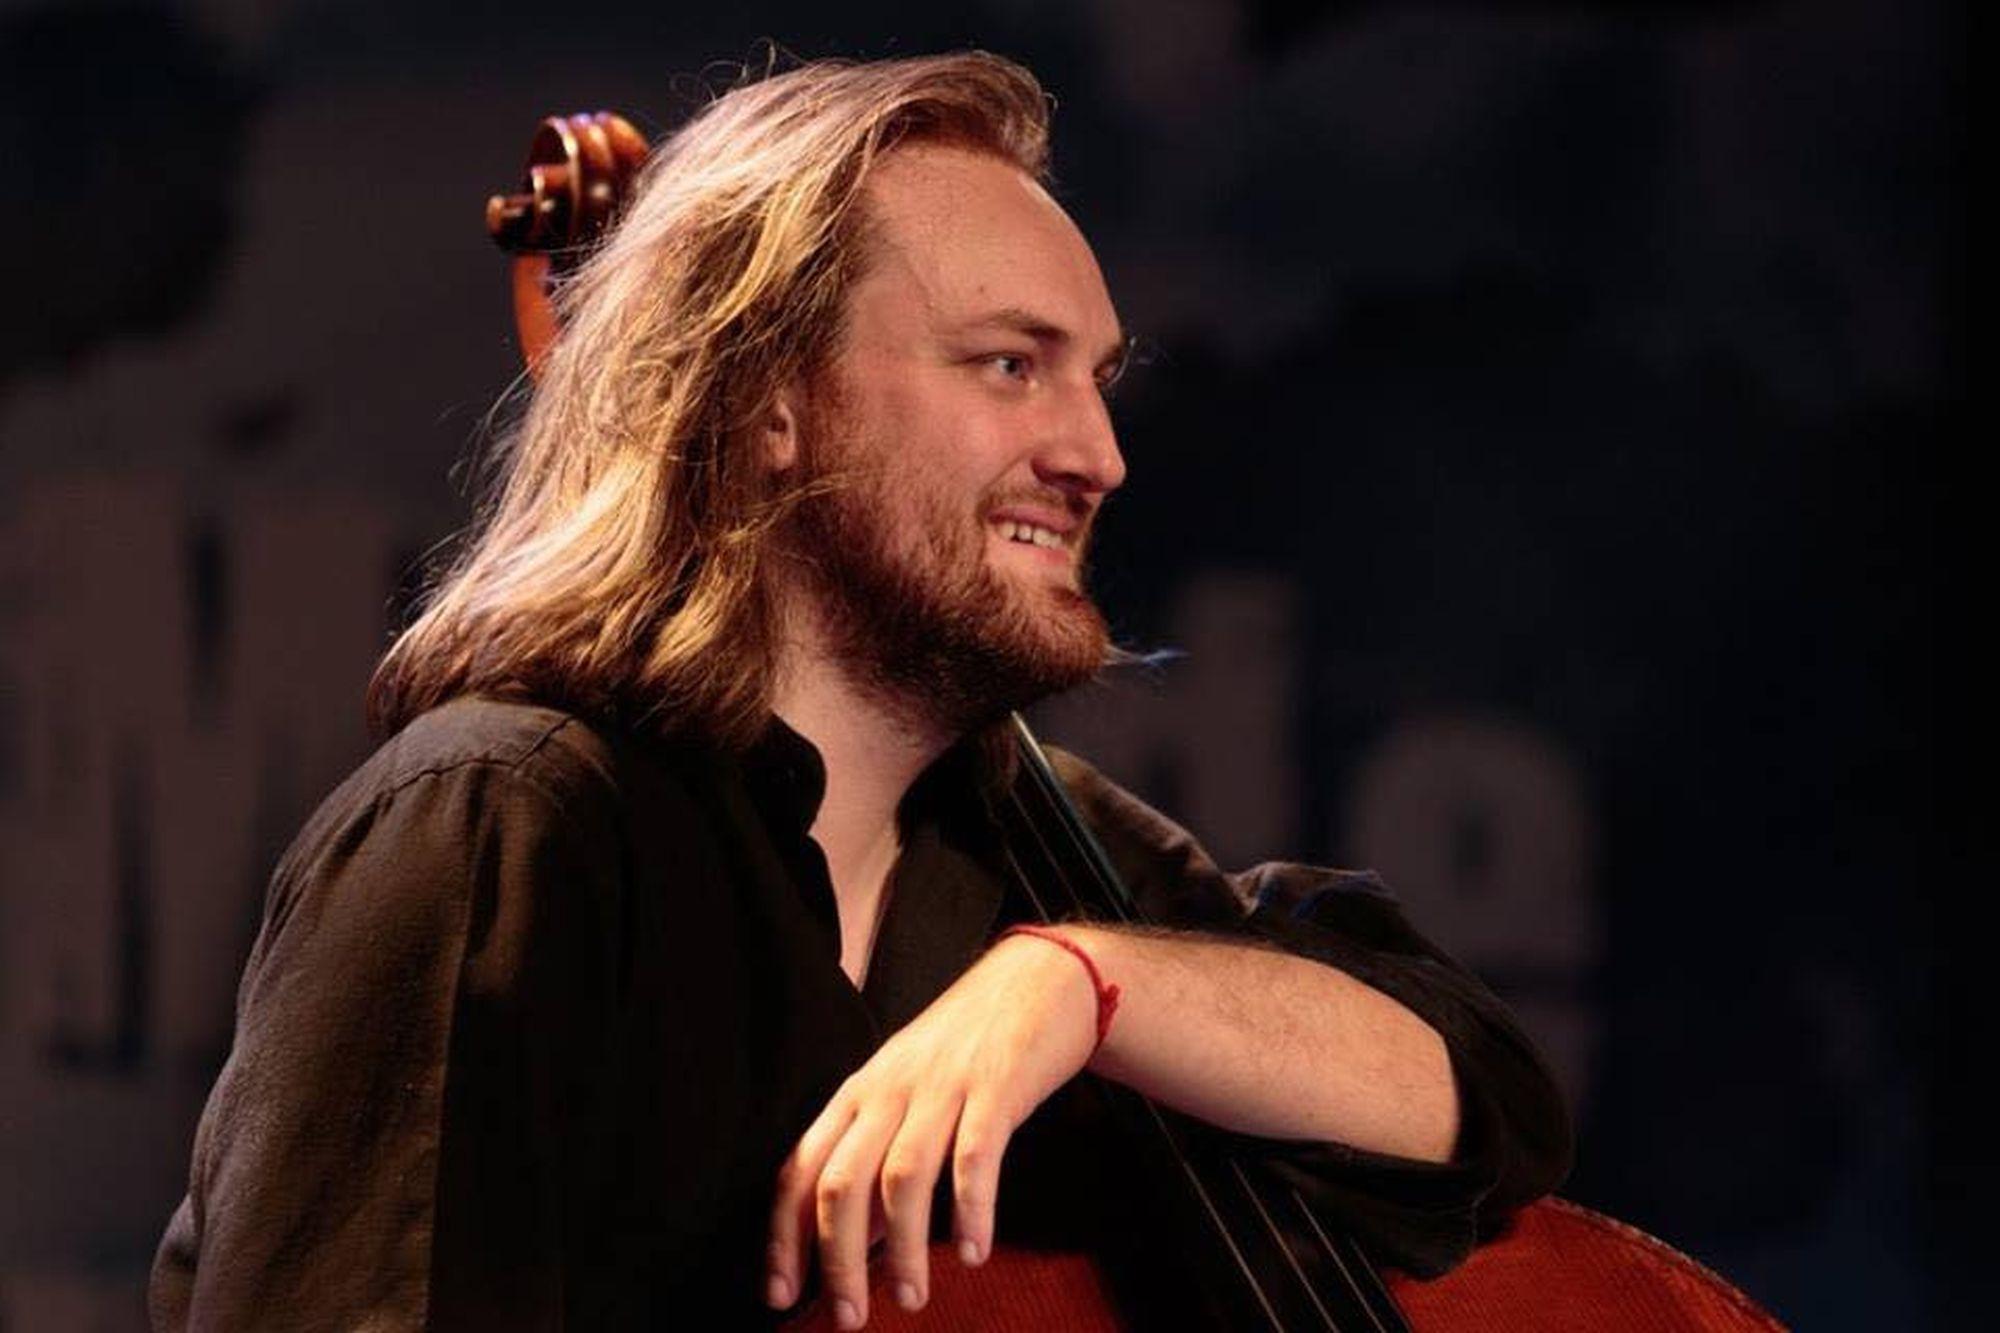 Seul contre basse: Adrien Tyberghein - CONCERT ANNULÉ